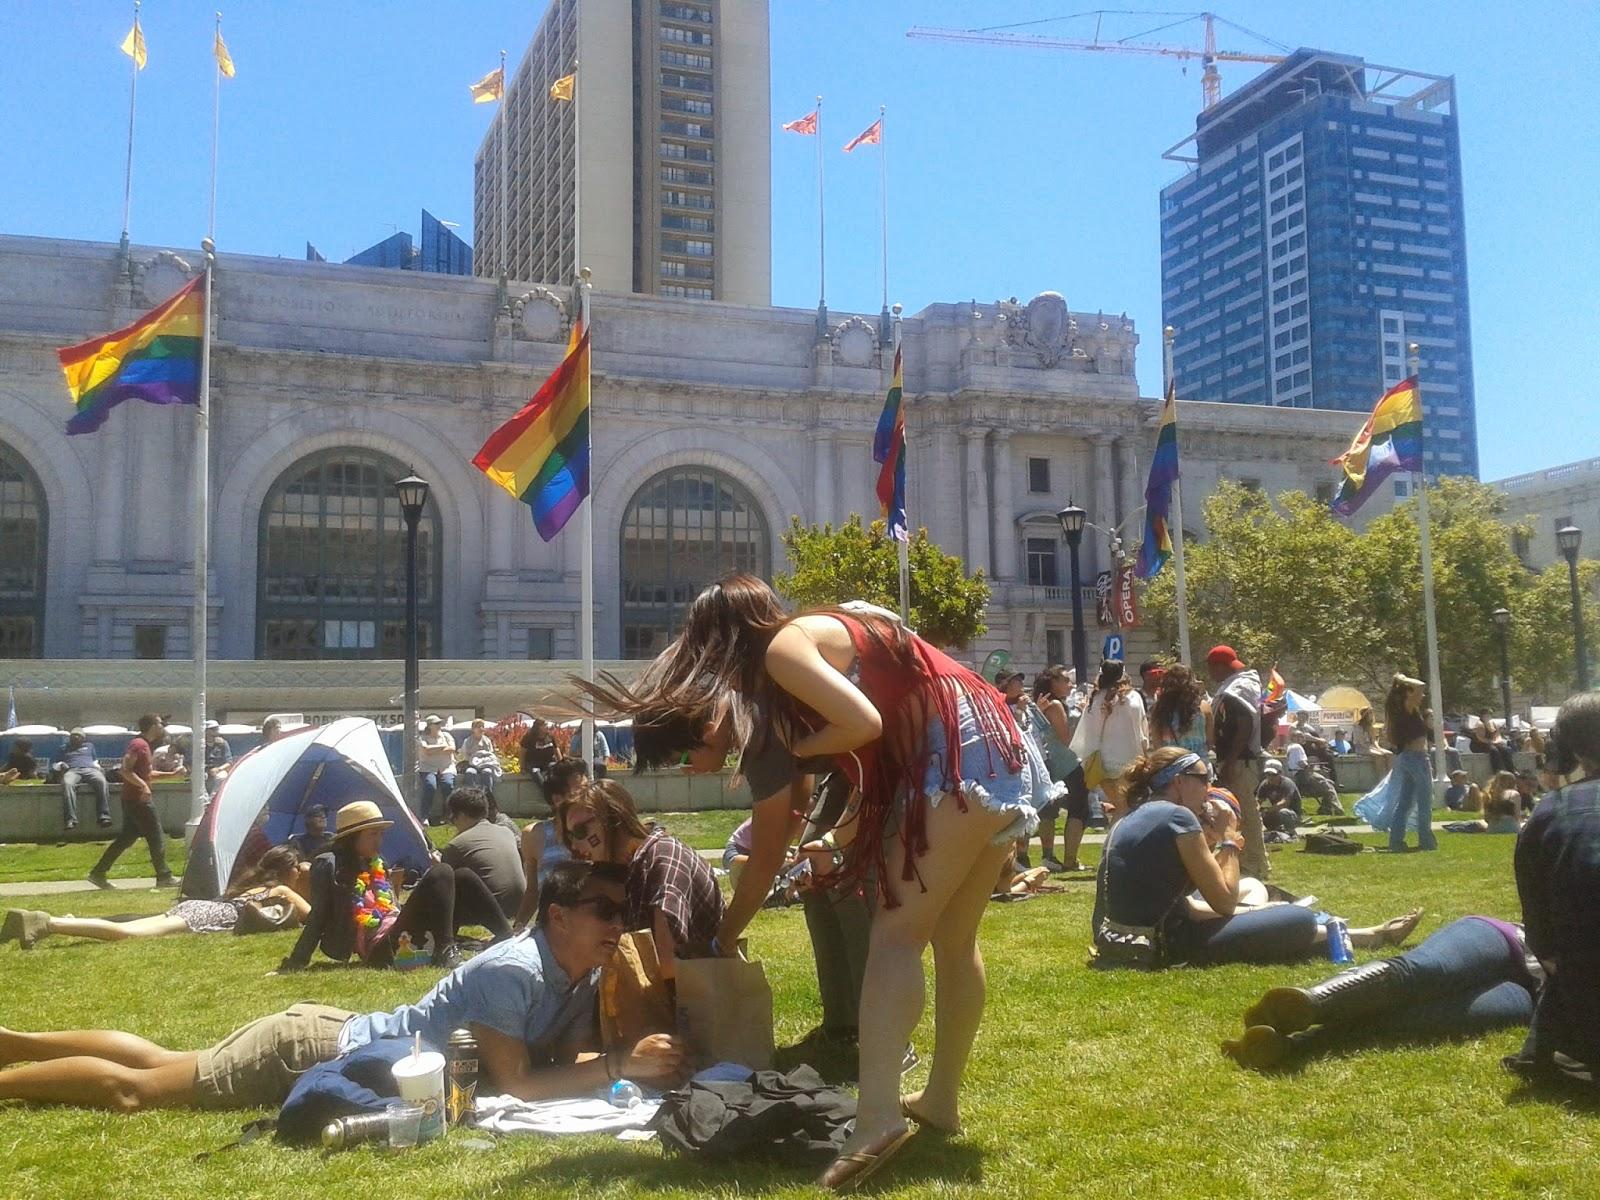 http://www.mytravelingchannel.fr/2014/07/san-francisco-event-gay-pride-2014.html